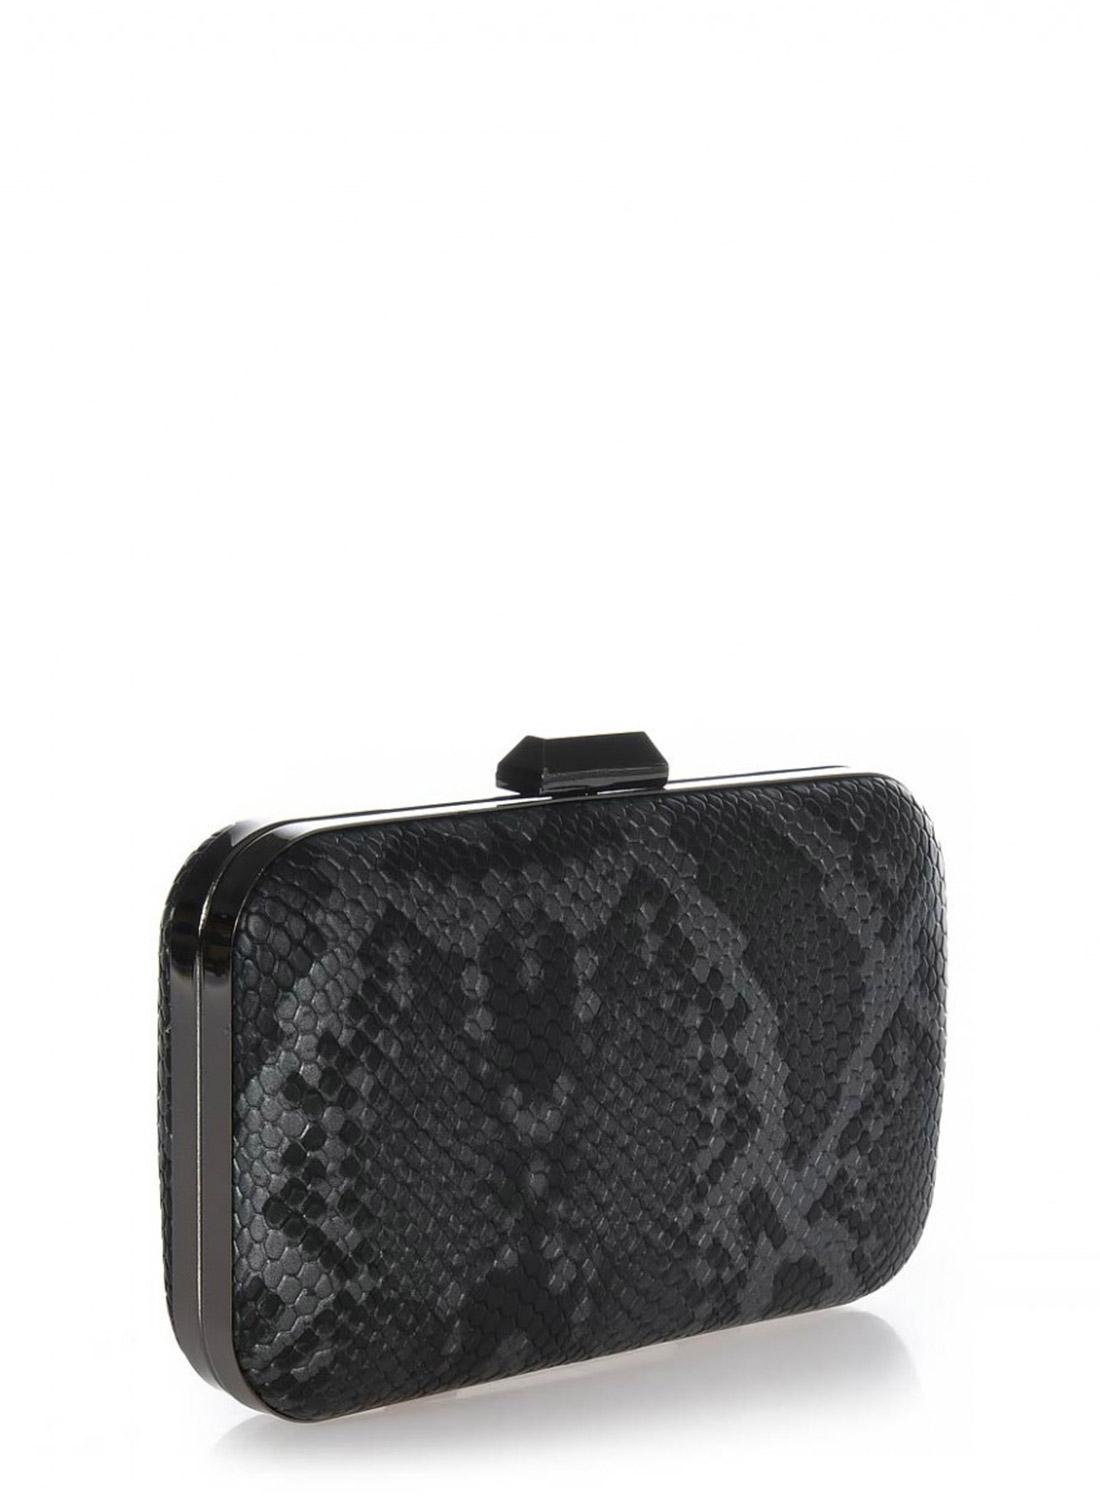 Clutch bag ανθρακί snake print με ανθρακί μεταλλική ράγα